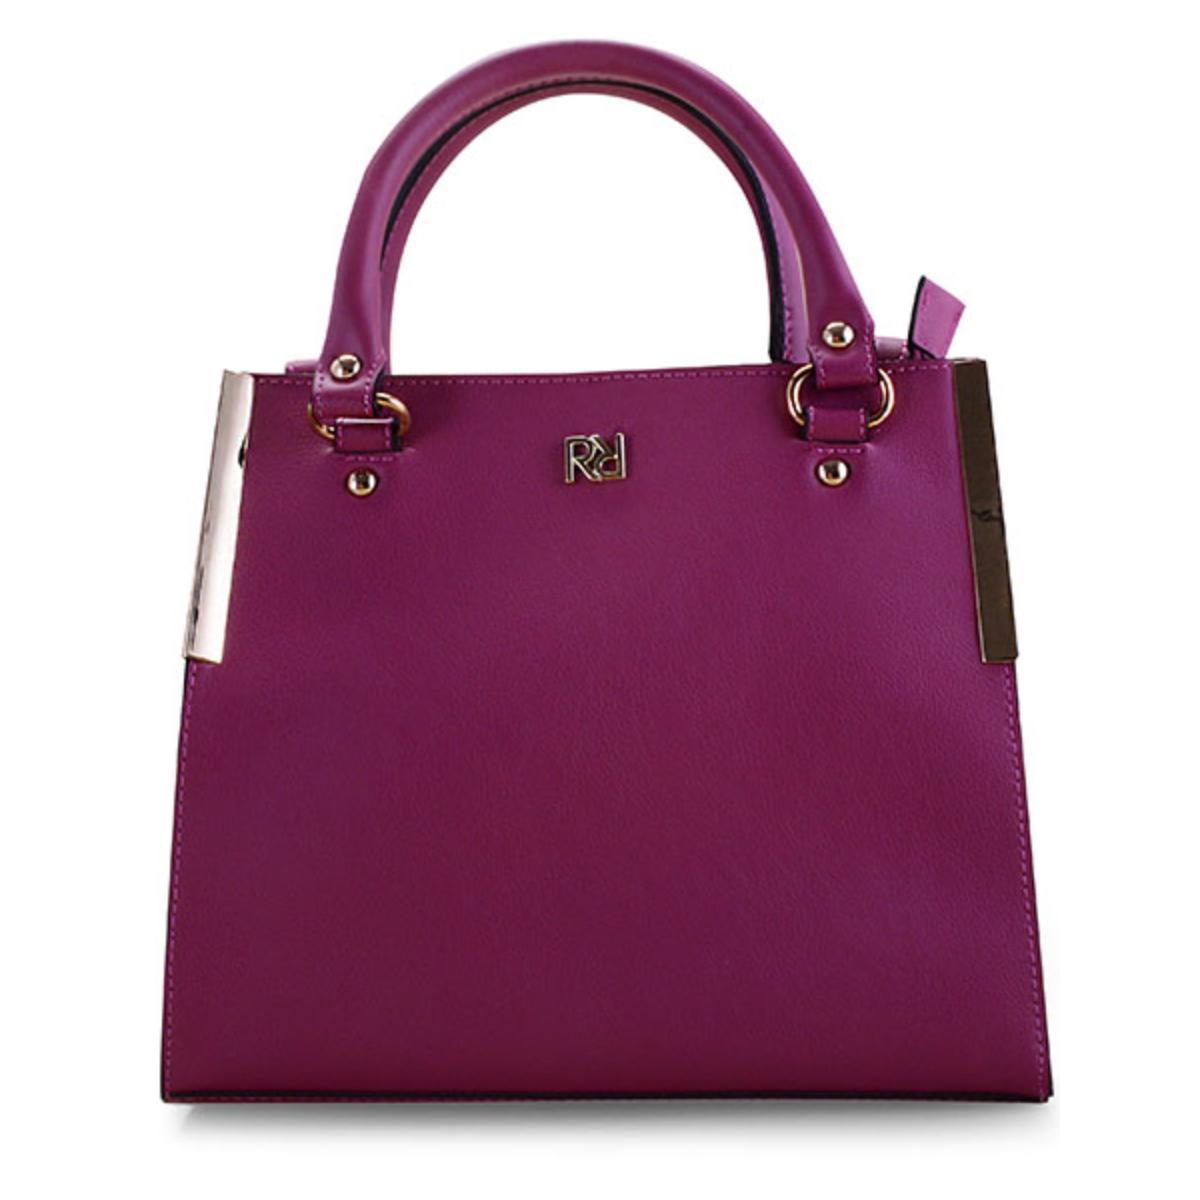 Bolsa Feminina Rafitthy 28.92174a Pink